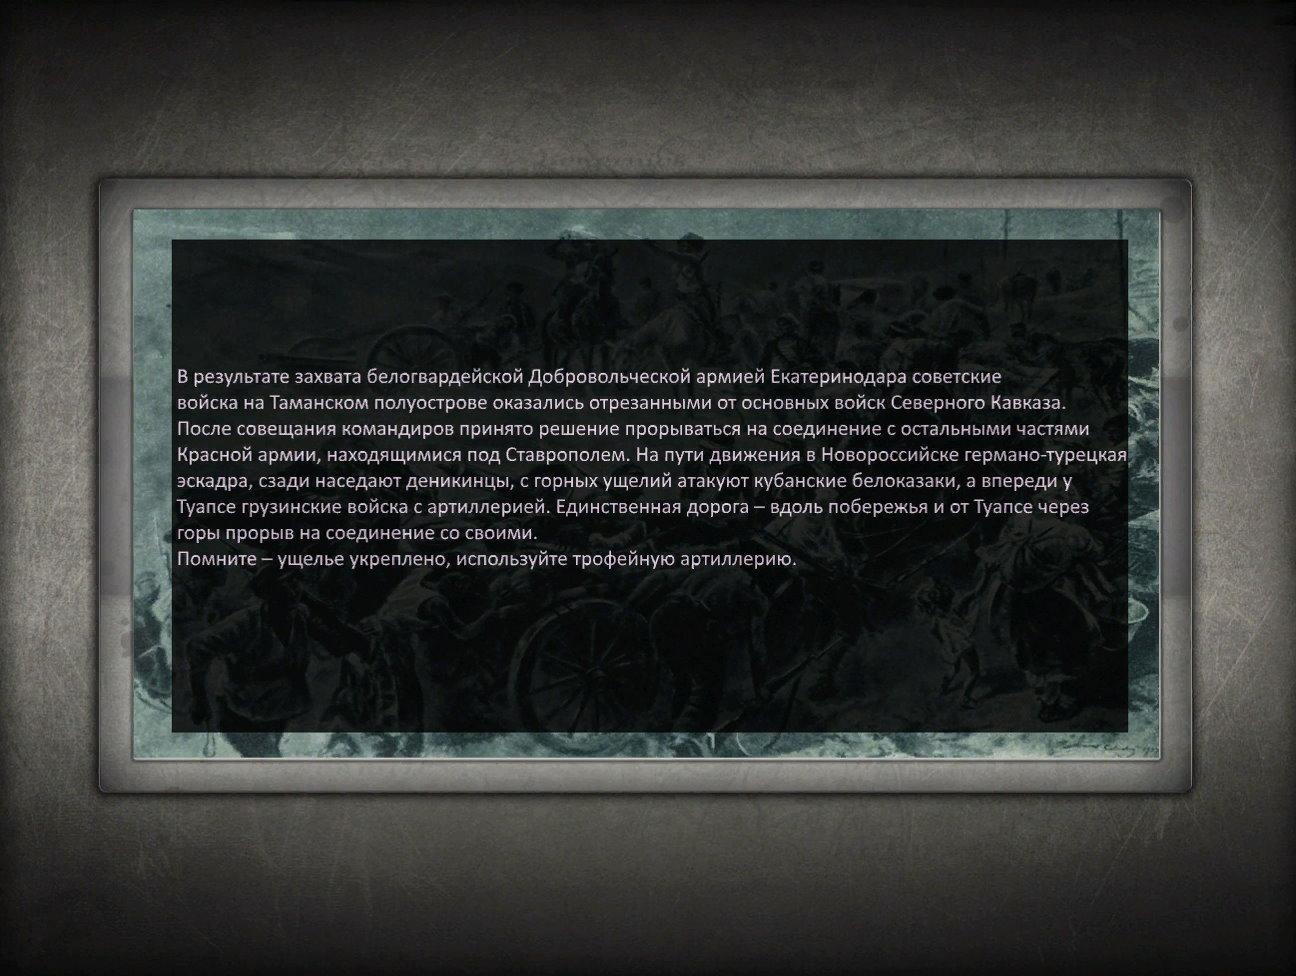 Civil War In Russia, Campaigns 9.0 (AS2 — 3.262.0) (v03.11.2020)